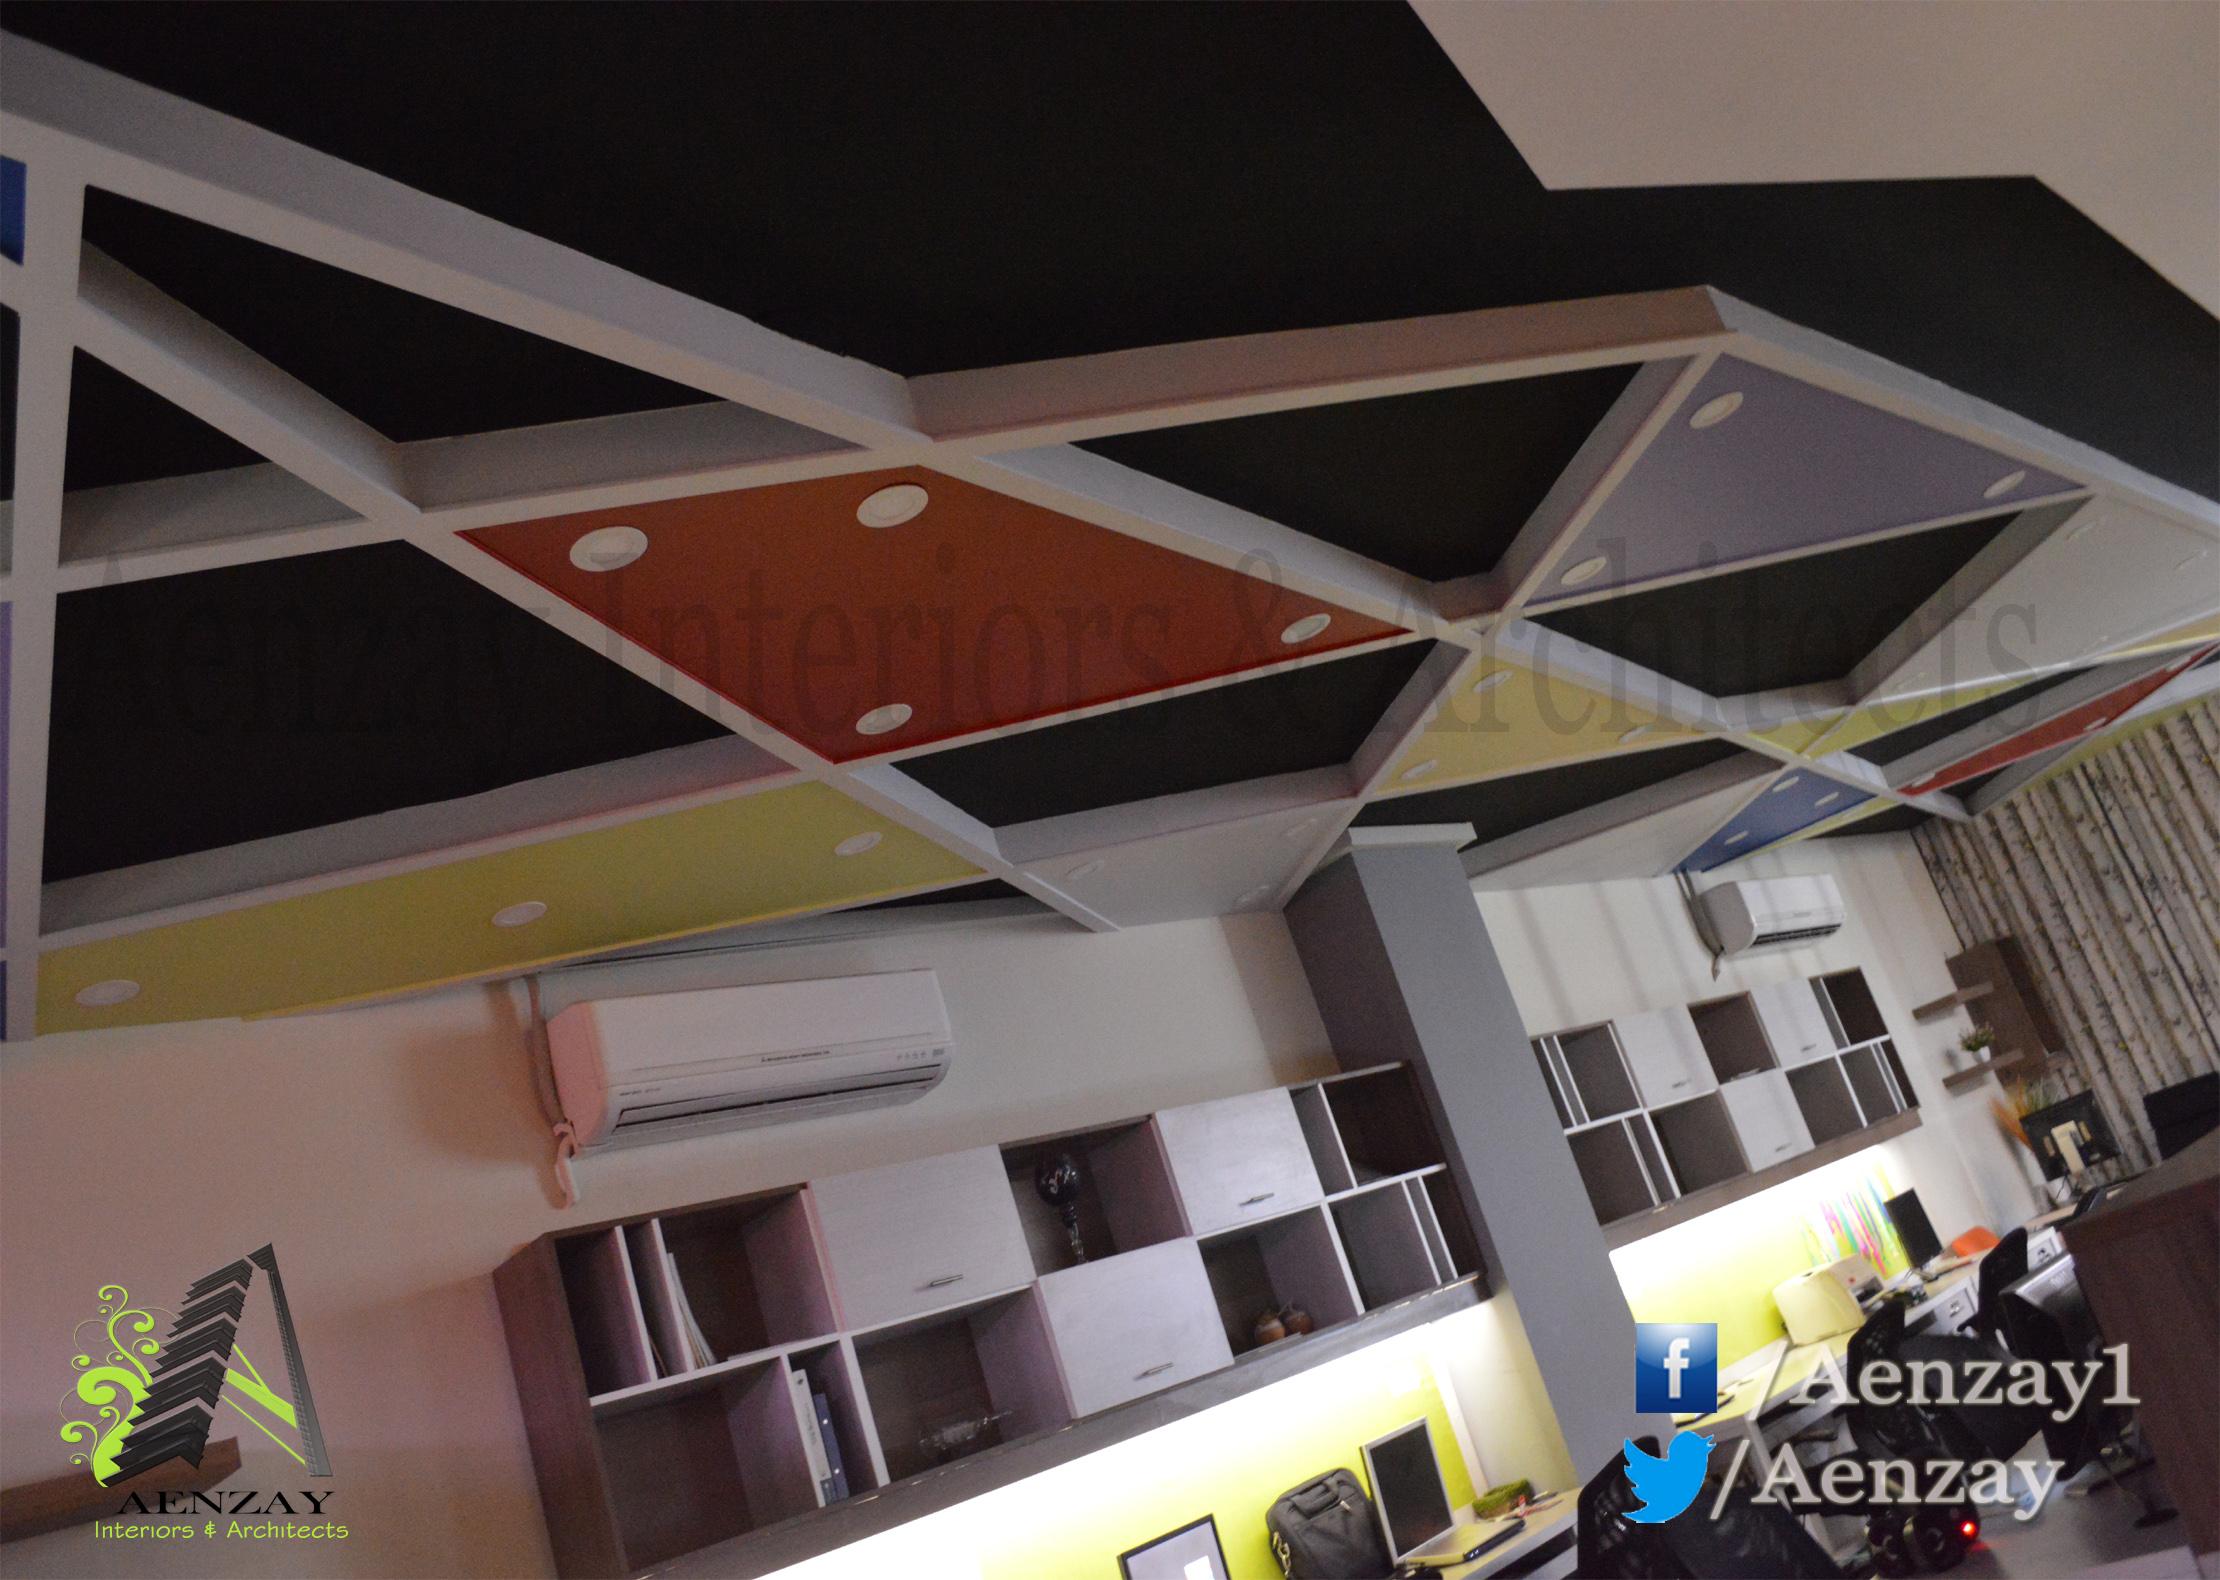 Aenzay Office Ceiling Design Aenzay Interiors